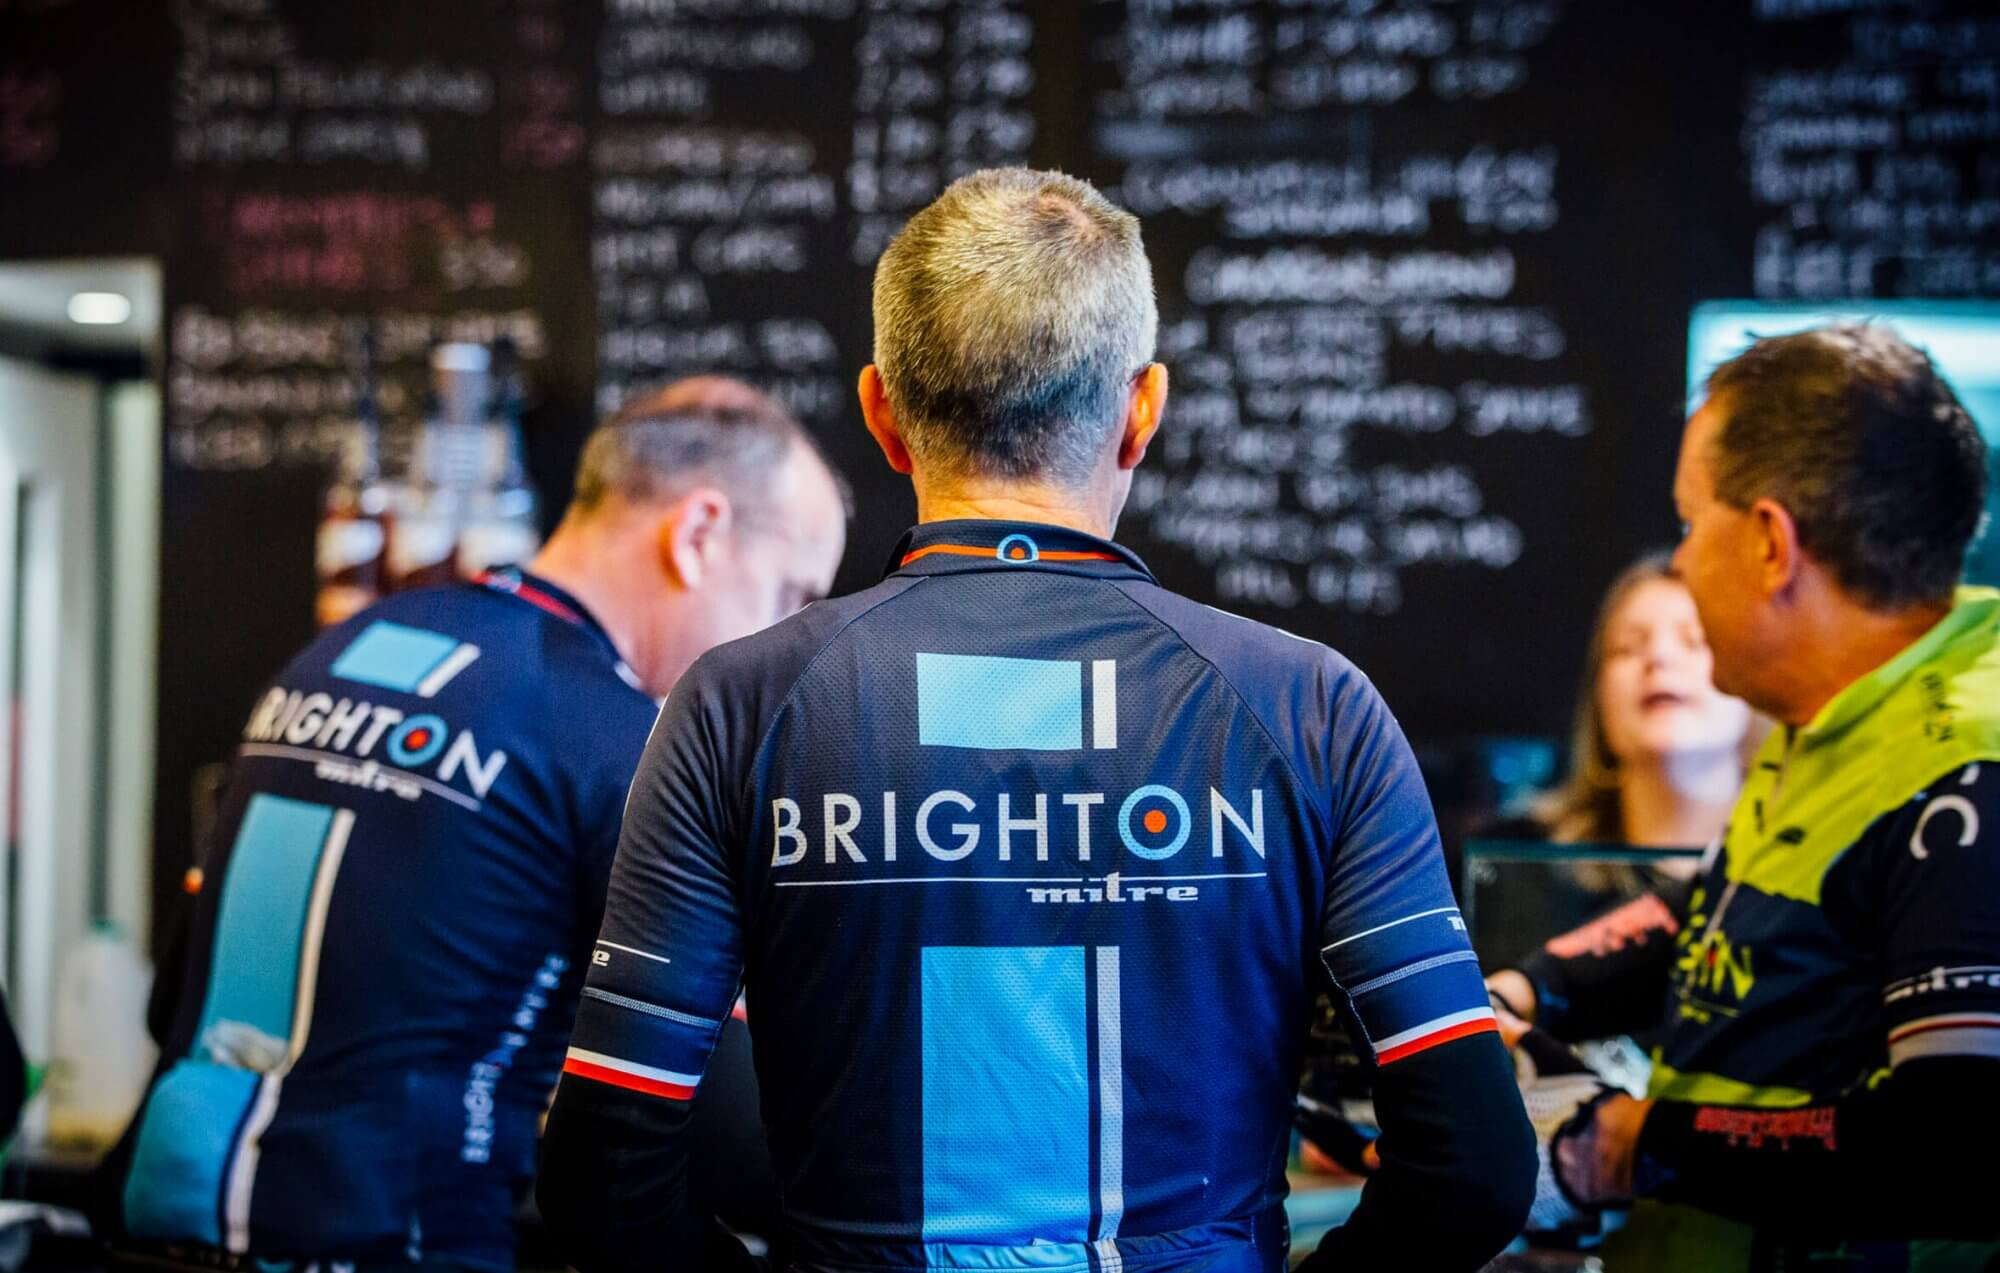 Brighton Mitre Cycling Club